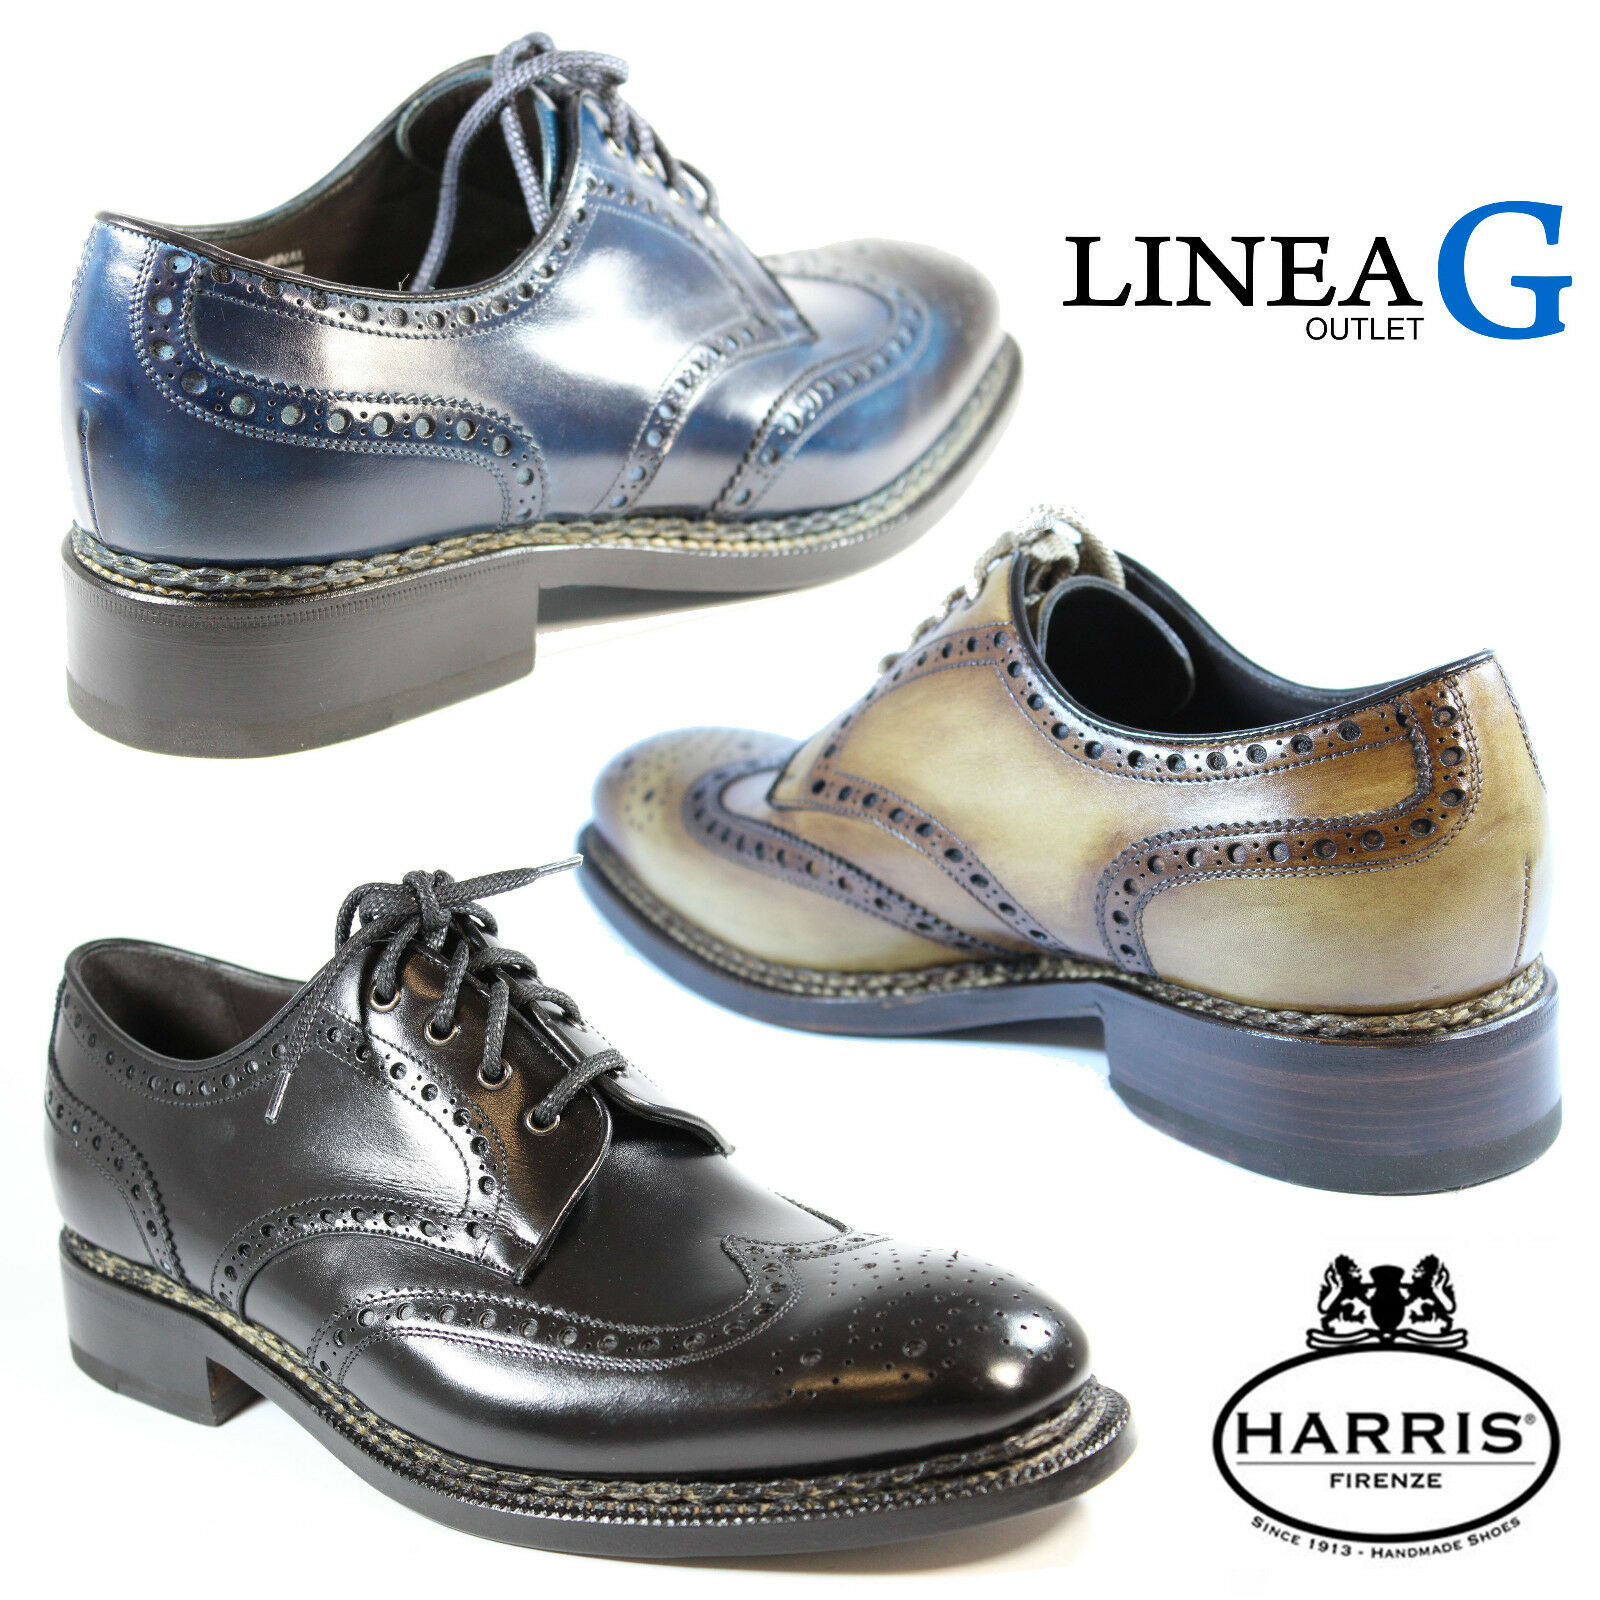 HARRIS leather derby schuhe schuhe stringate in pelle artigianali artigianali artigianali dc68f2